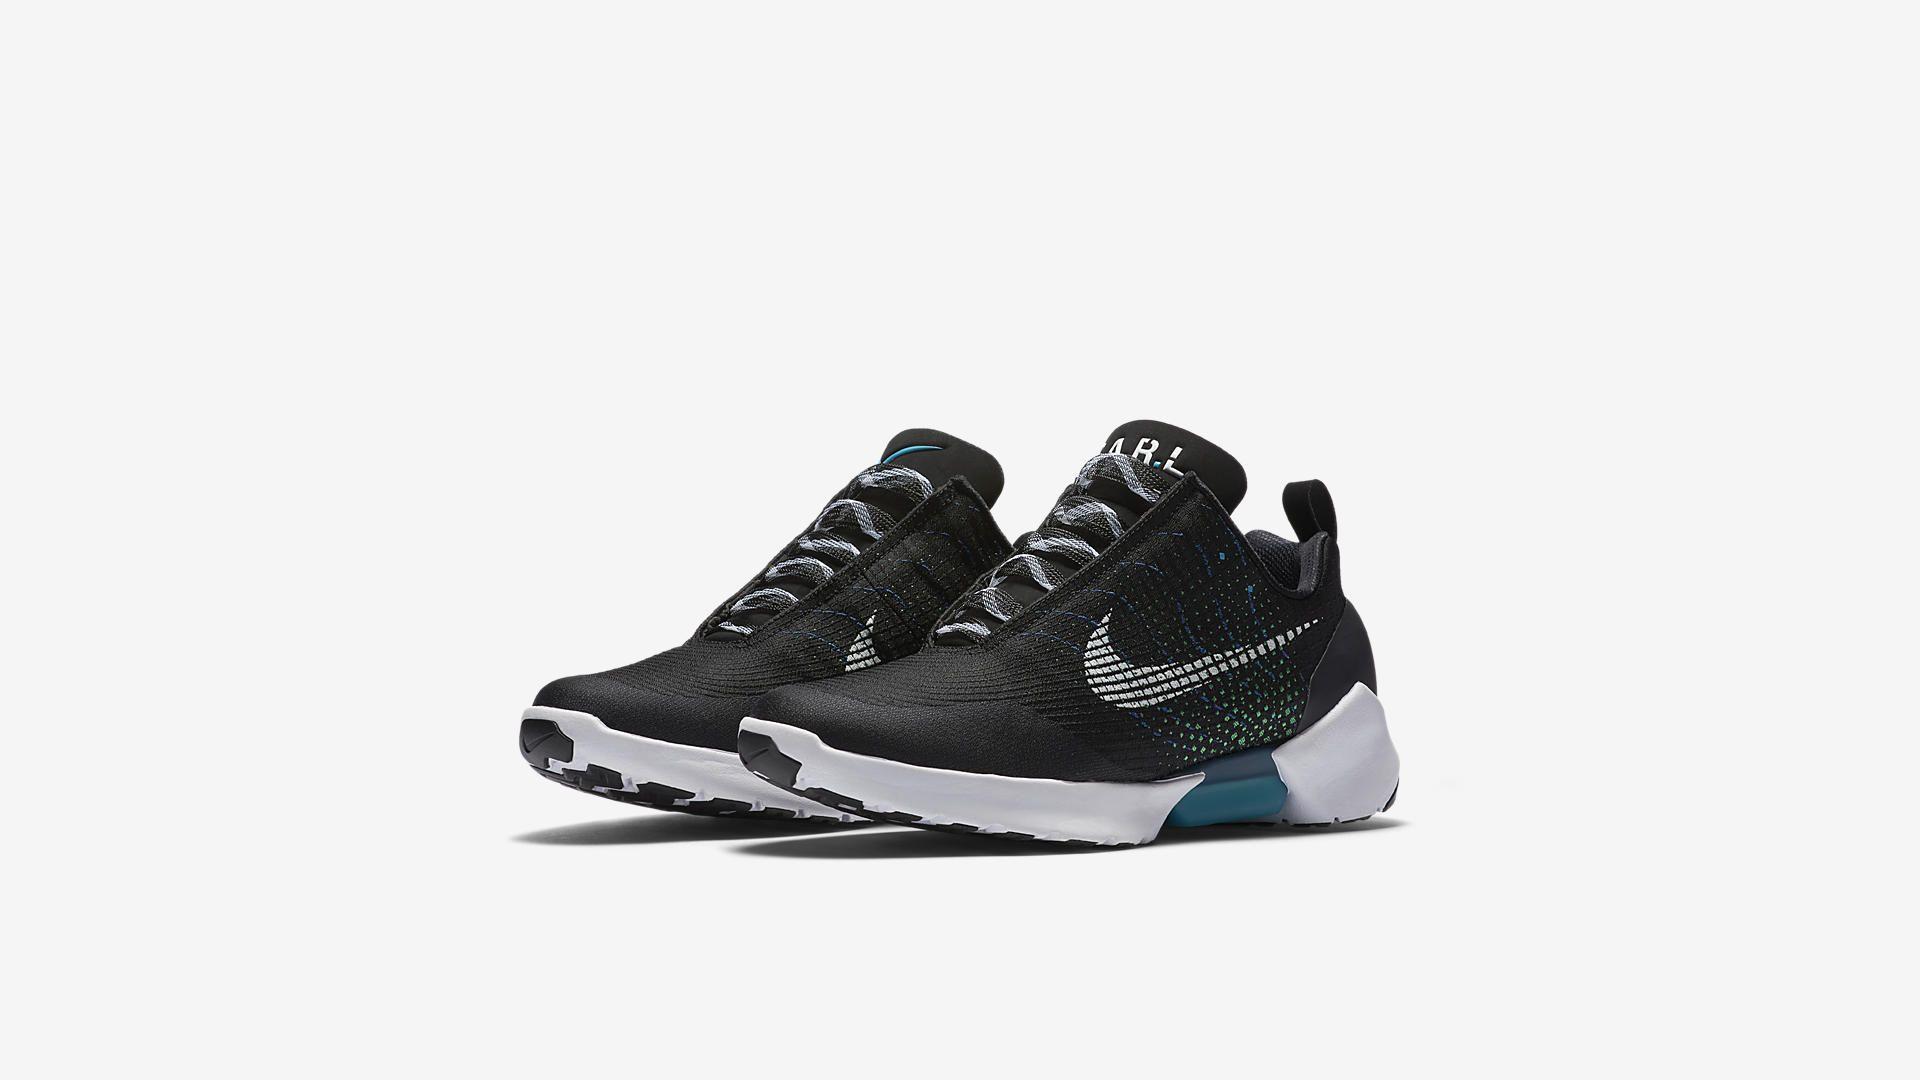 Nike Flyknit Racer – Rough Green, , #agpos, #sneaker, #sneakers,  #sneakerhead, #solecollector, #sneakerfreaker, #nicekicks, #kicks, #kotd,  #kicks4…